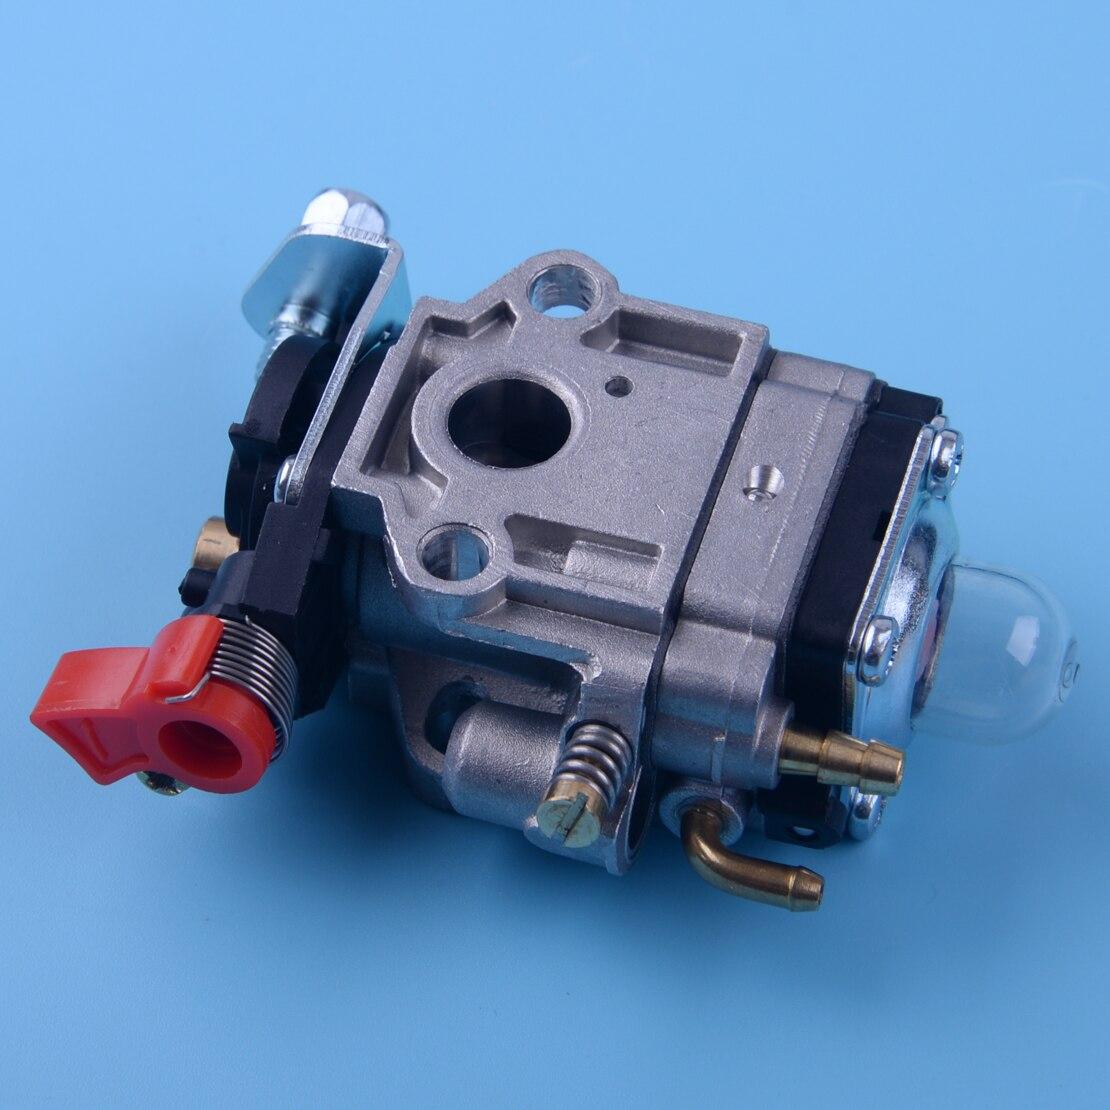 LETAOSK Carburetor Fit For 24cc 25cc 26cc Brushcutter Generator Hedge Trimmer Leaf Blower Parts Accessories